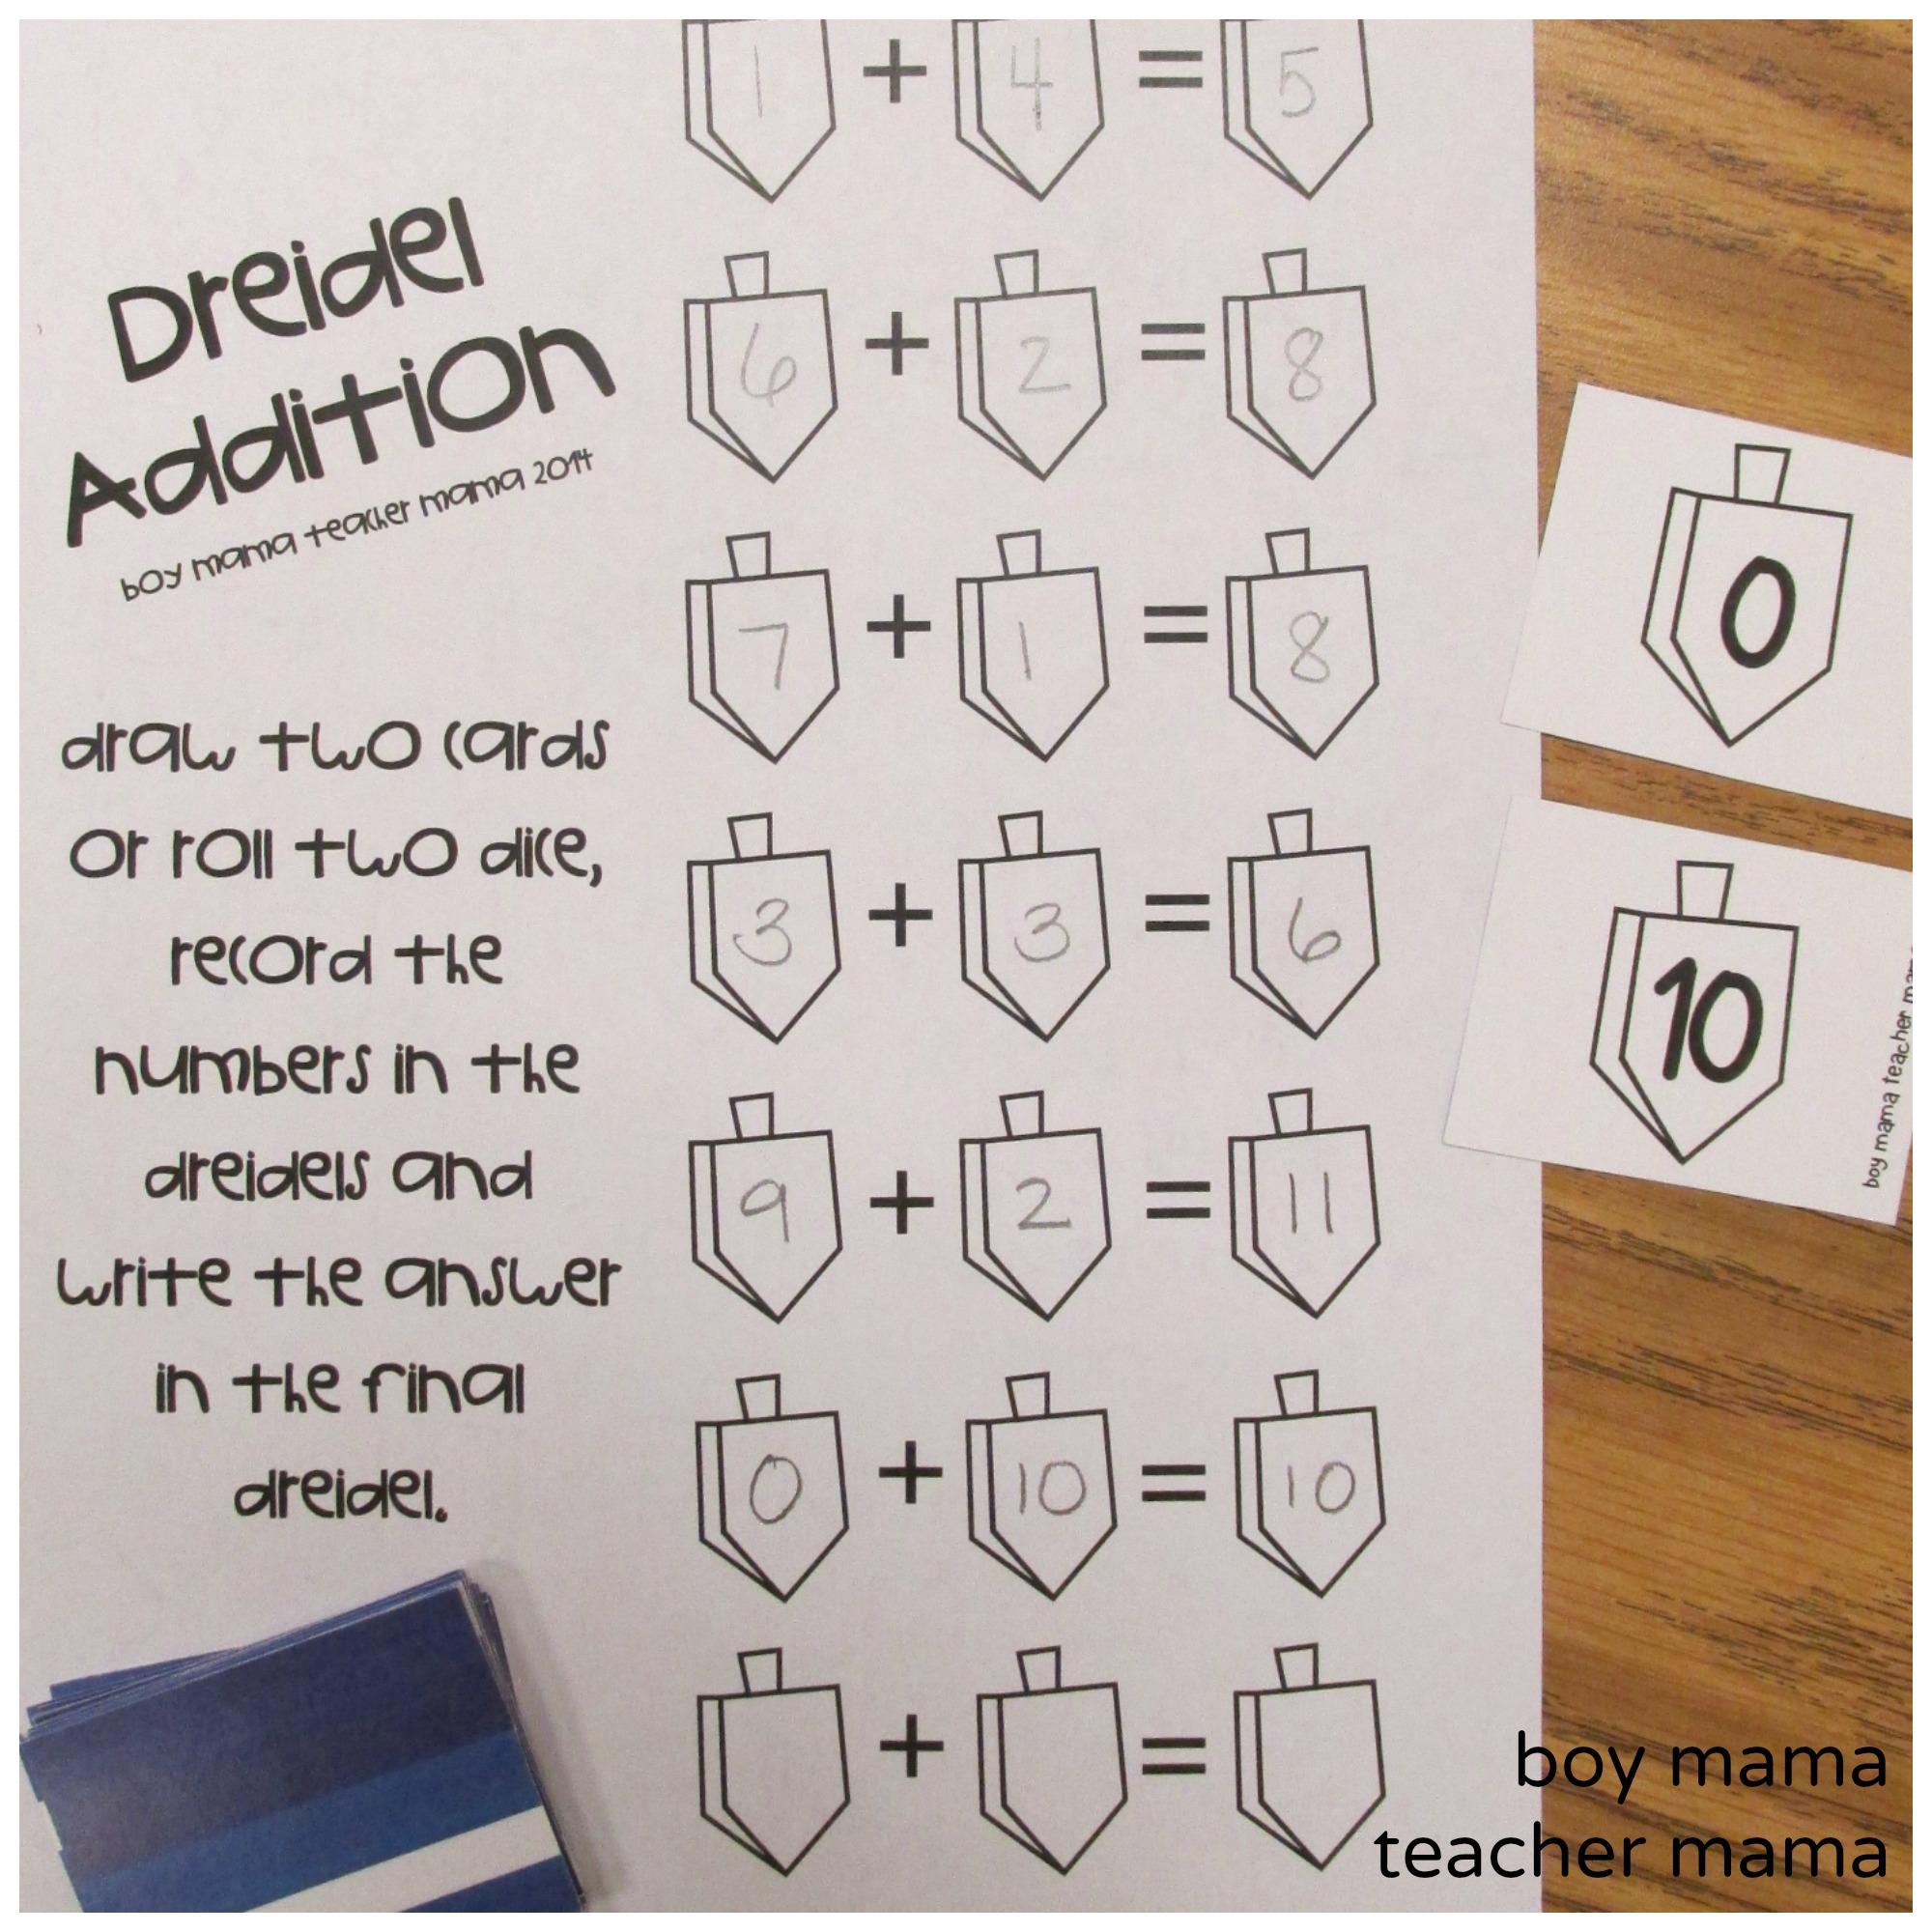 graphic regarding How to Play the Dreidel Game Printable identify Trainer Mama: Cost-free Printable Dreidel Math Match When University